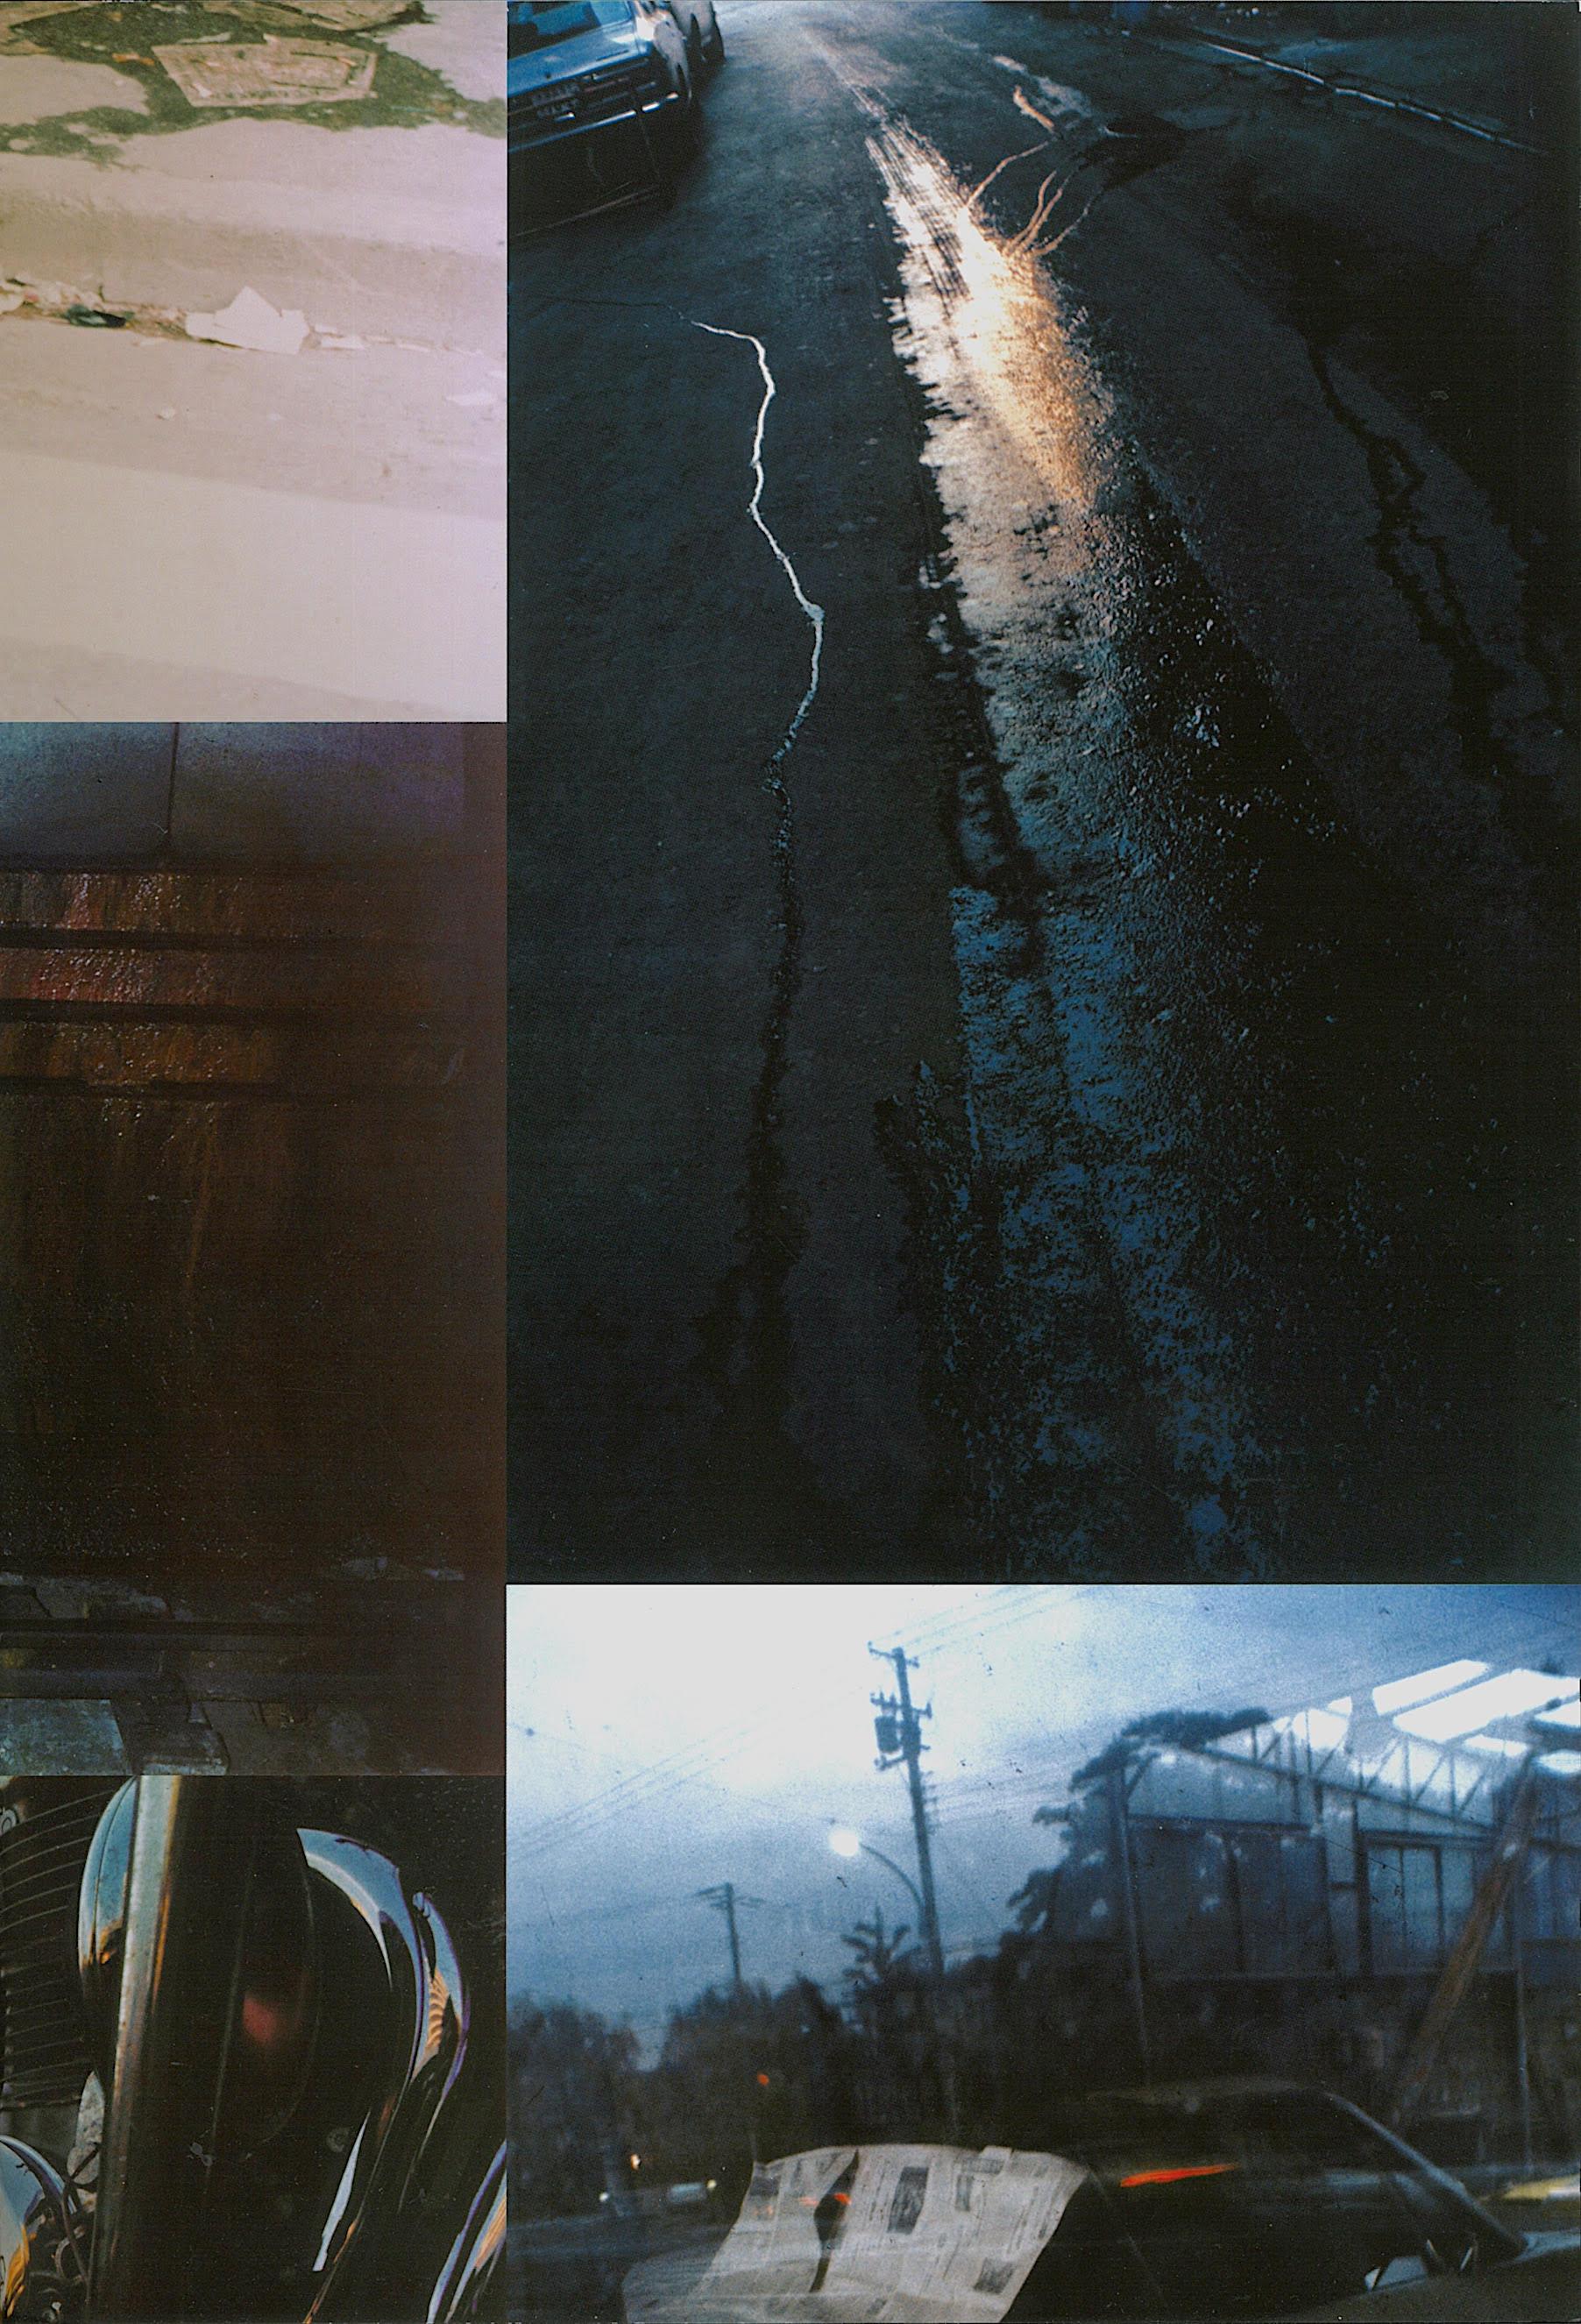 [An Illustrated Dictionary of Urban Overflows: Nakahira Takuma's Urban Photography and Writing]